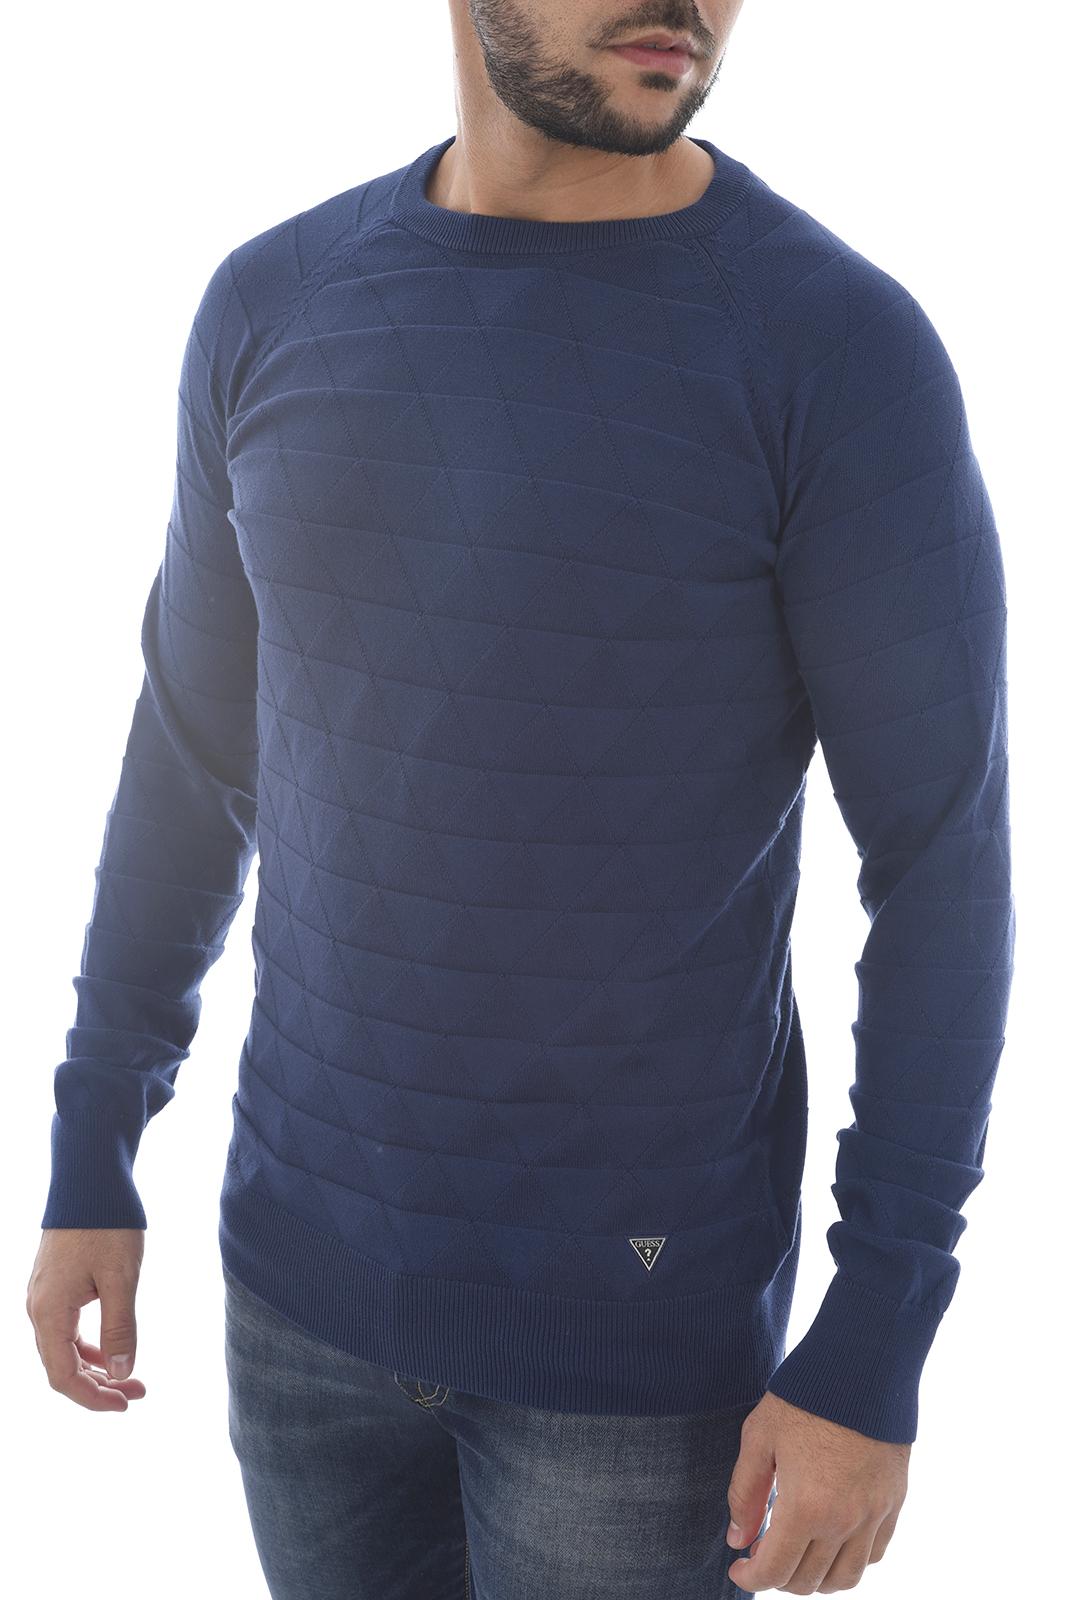 HOMME  Guess jeans U84R02 Z0990 A752 EVENING BLUE